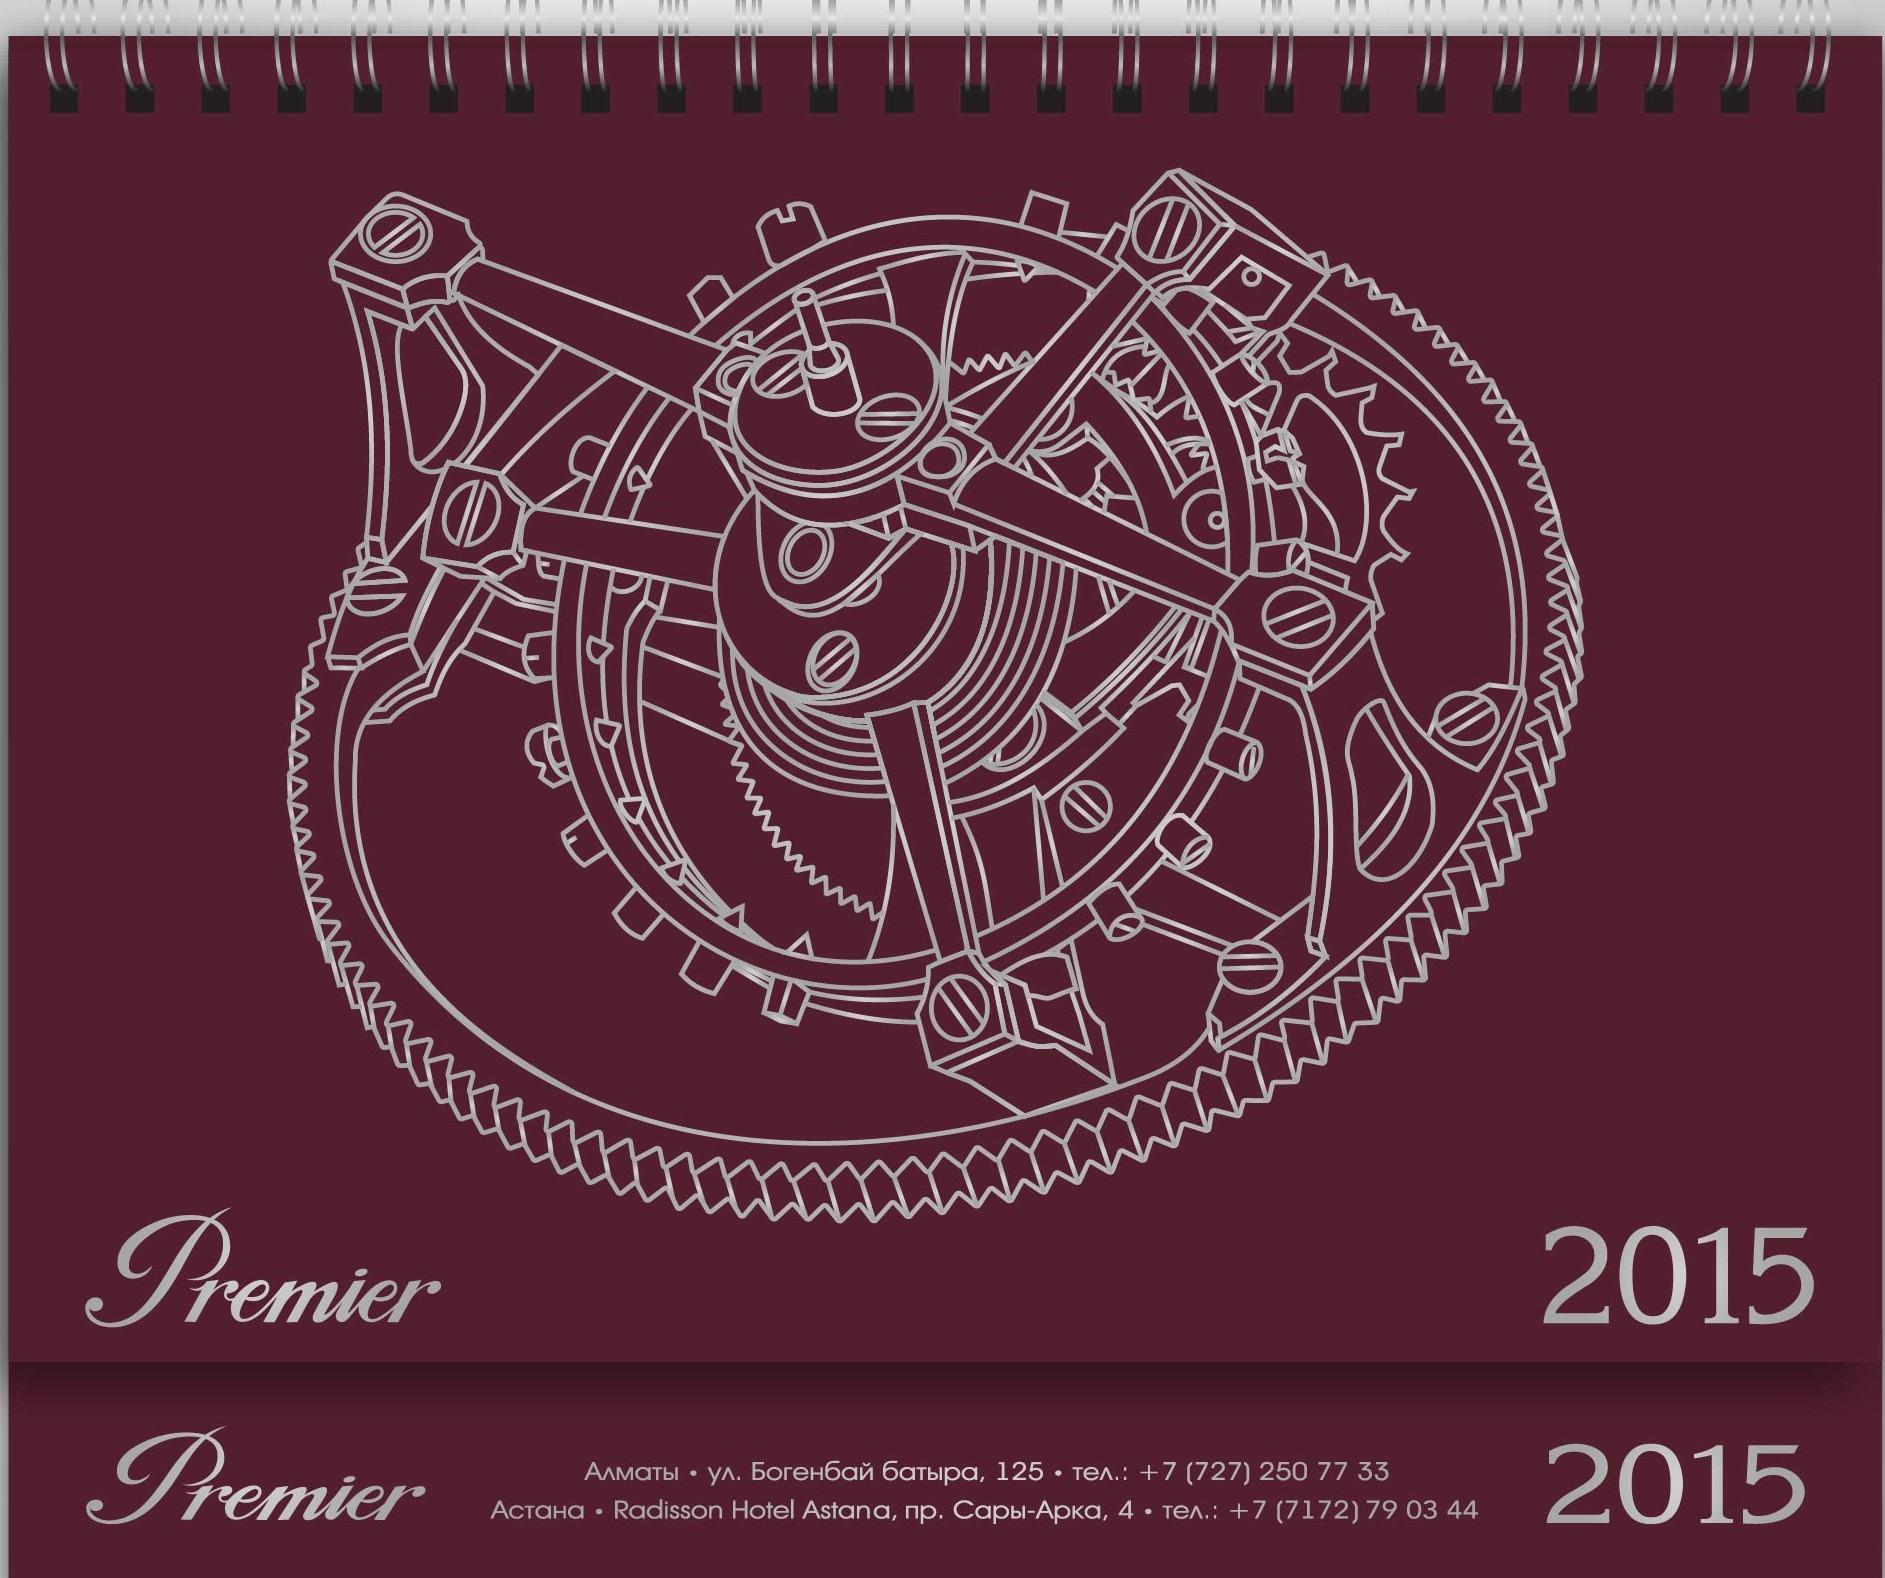 Премьер календарь 2015